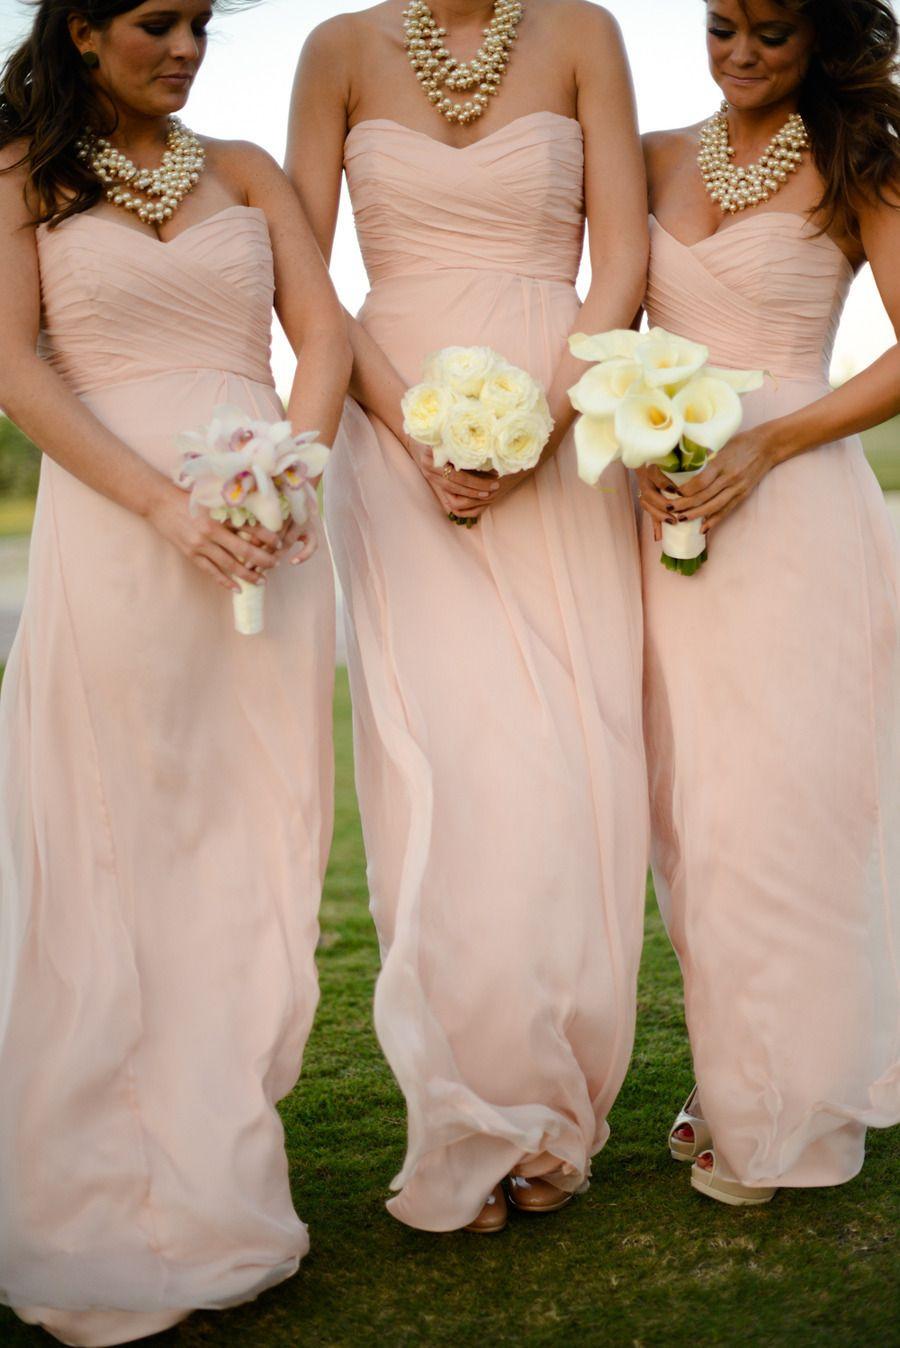 Pin by pinch ijiran on motif pinterest pale pink bridesmaids